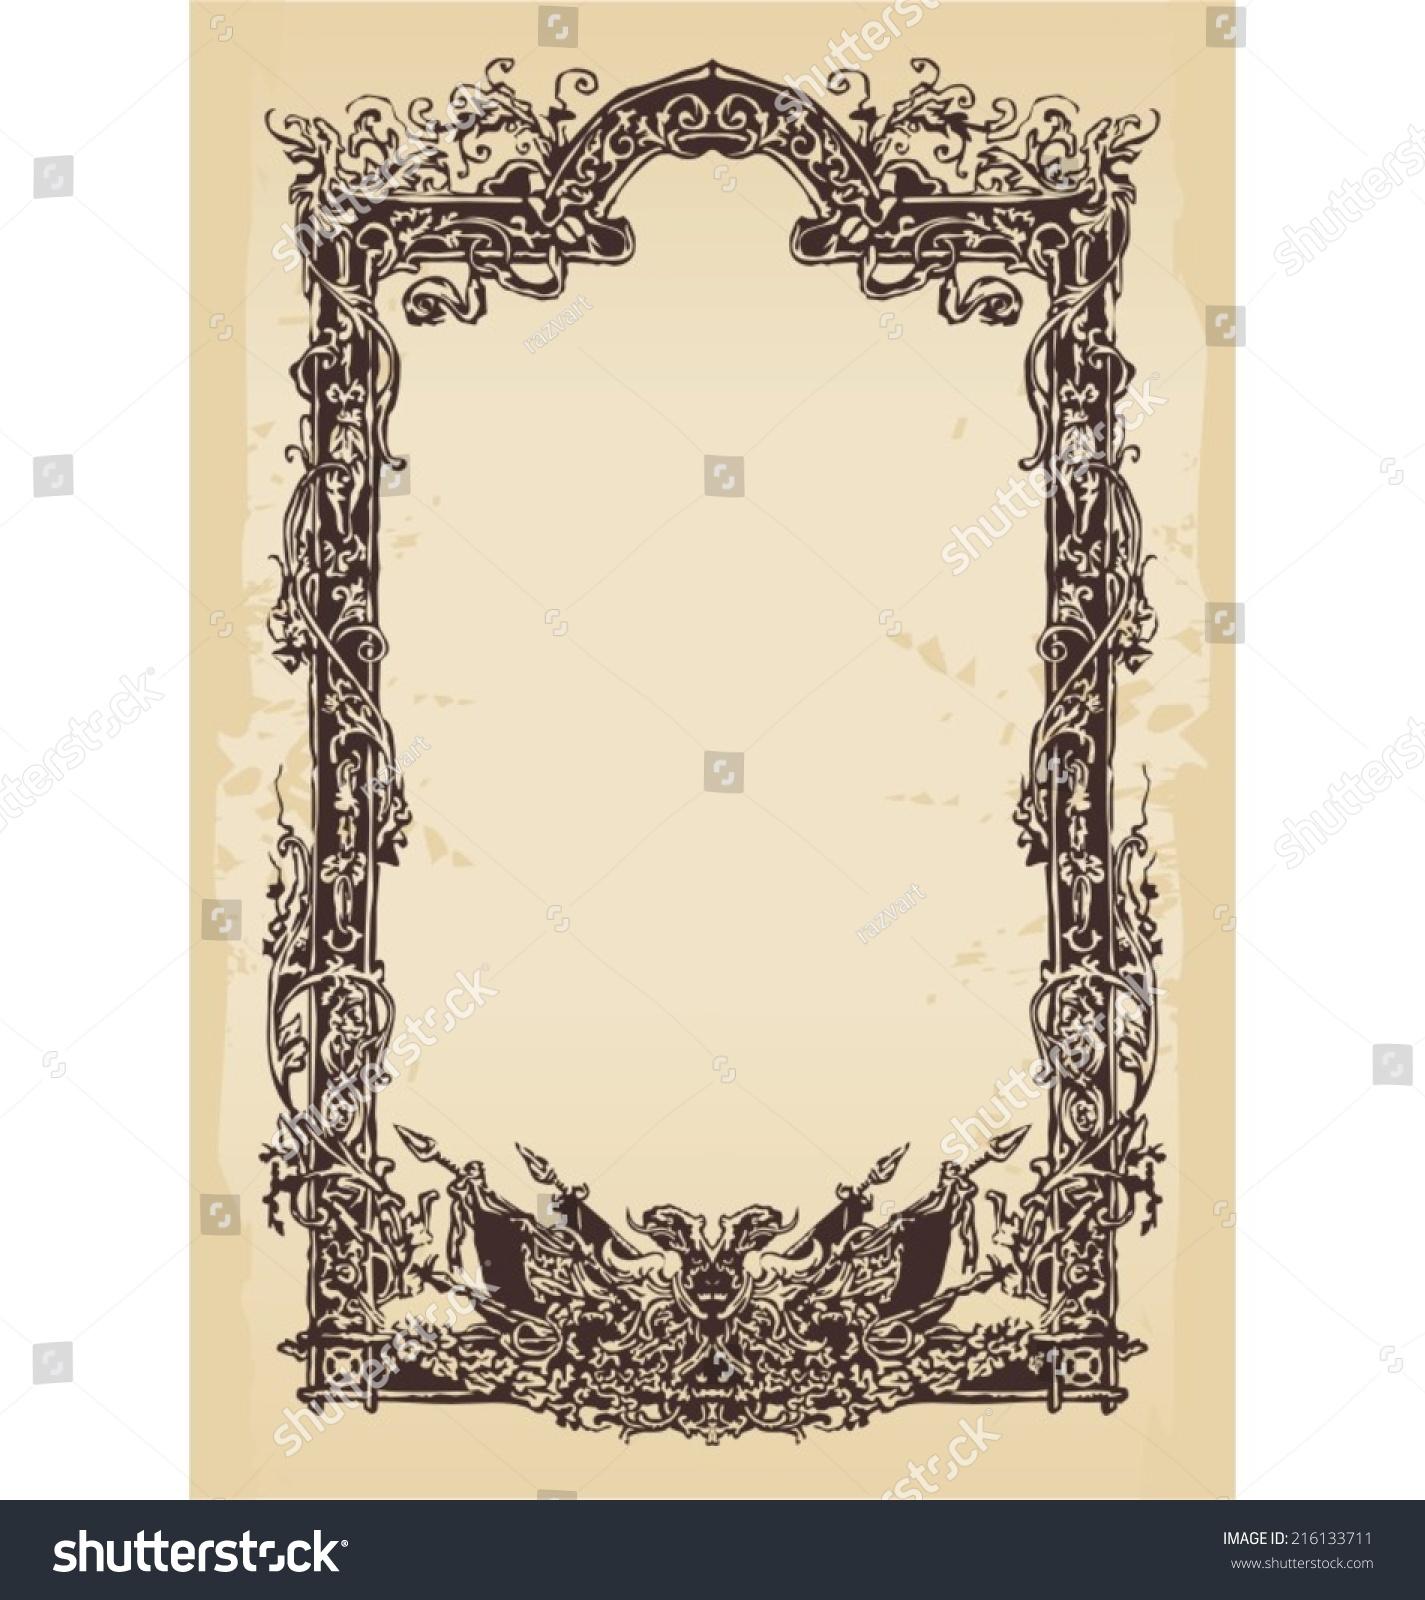 ppt 背景 背景图片 边框 模板 设计 相框 1425_1600